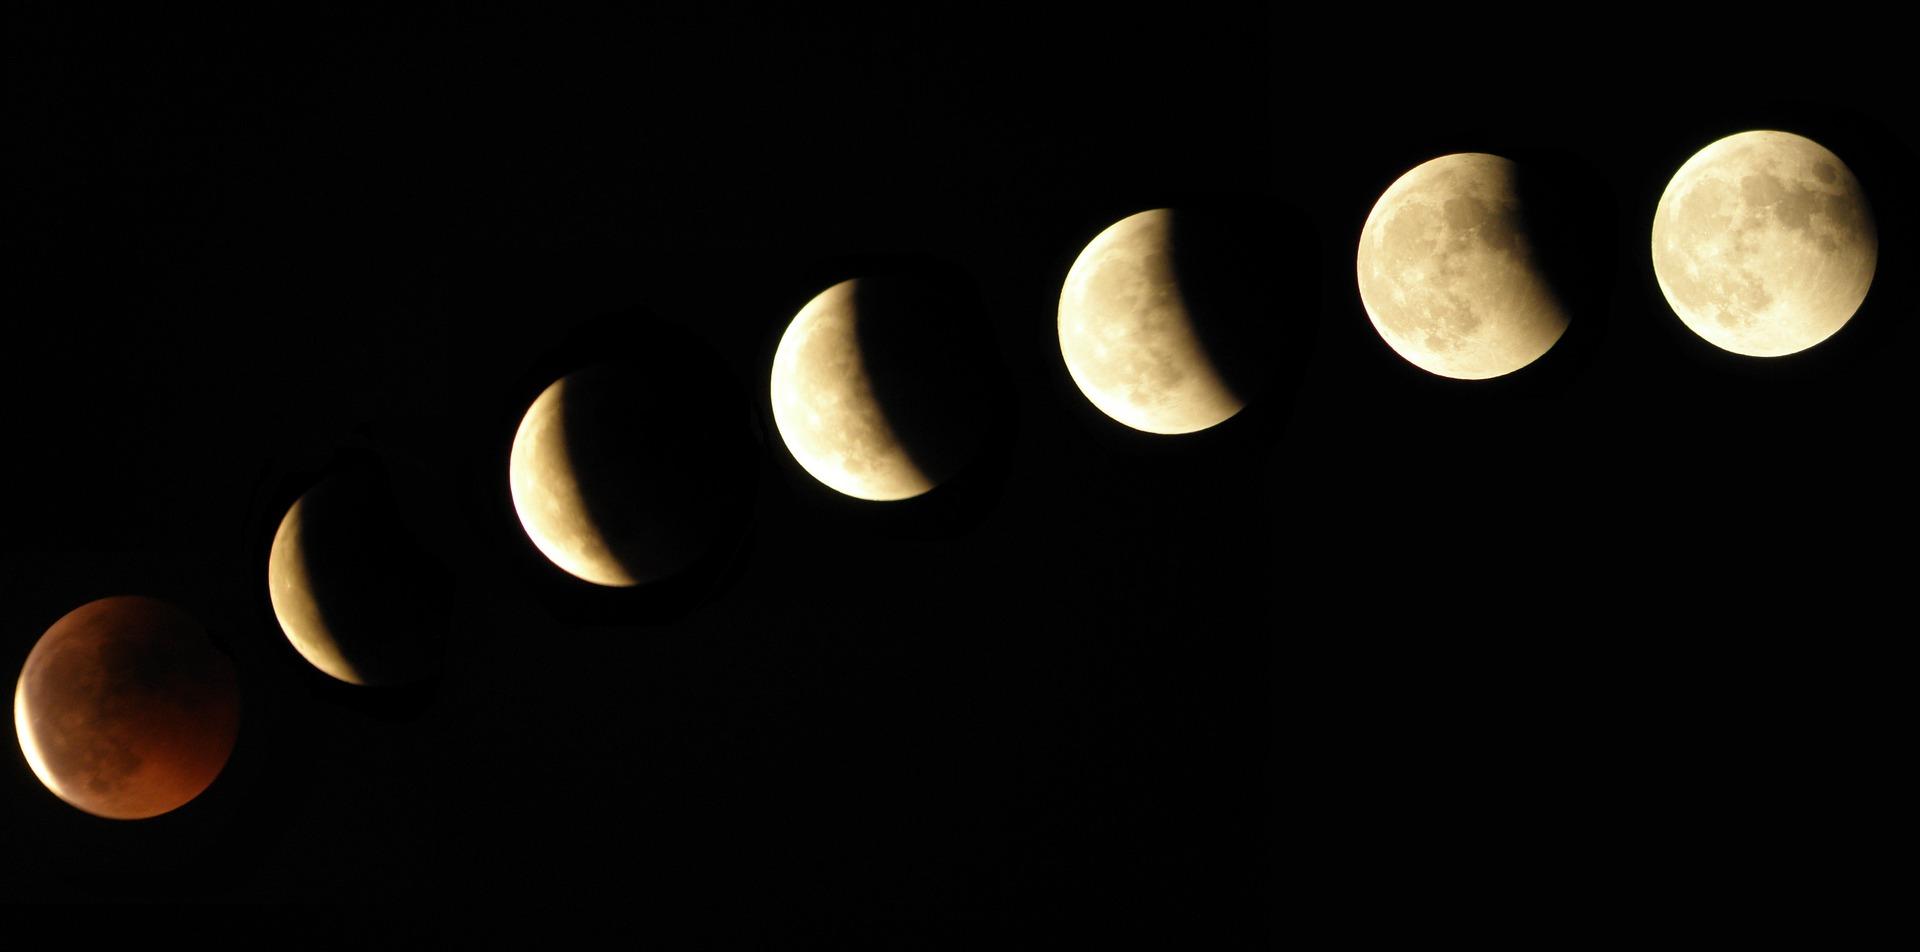 Calendario lunar 2019: las fases de la luna mes a mes